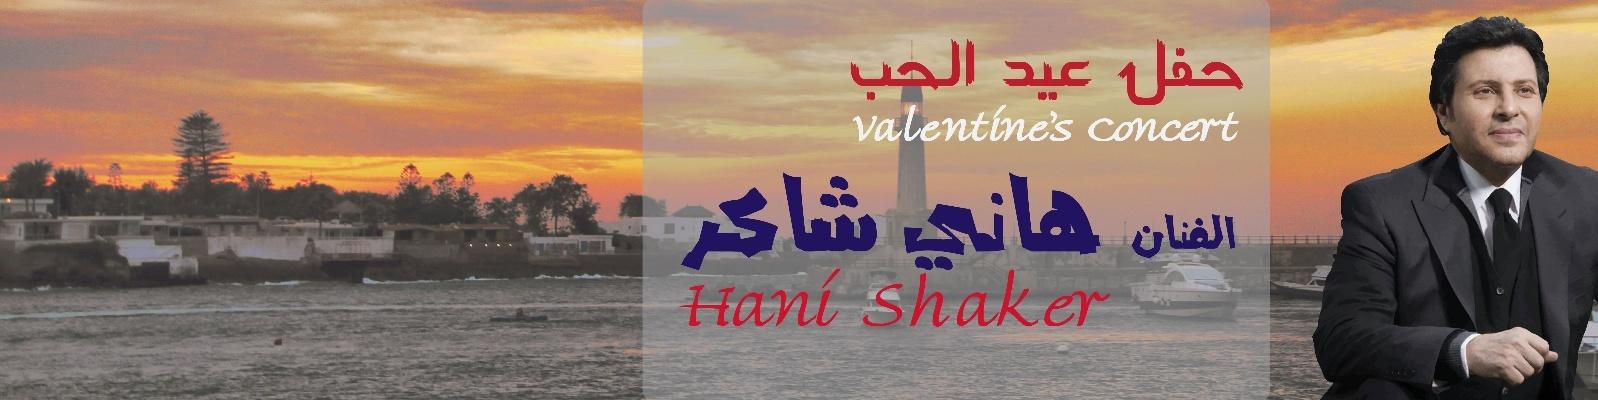 Hani Shaker Valentine's Day Concert